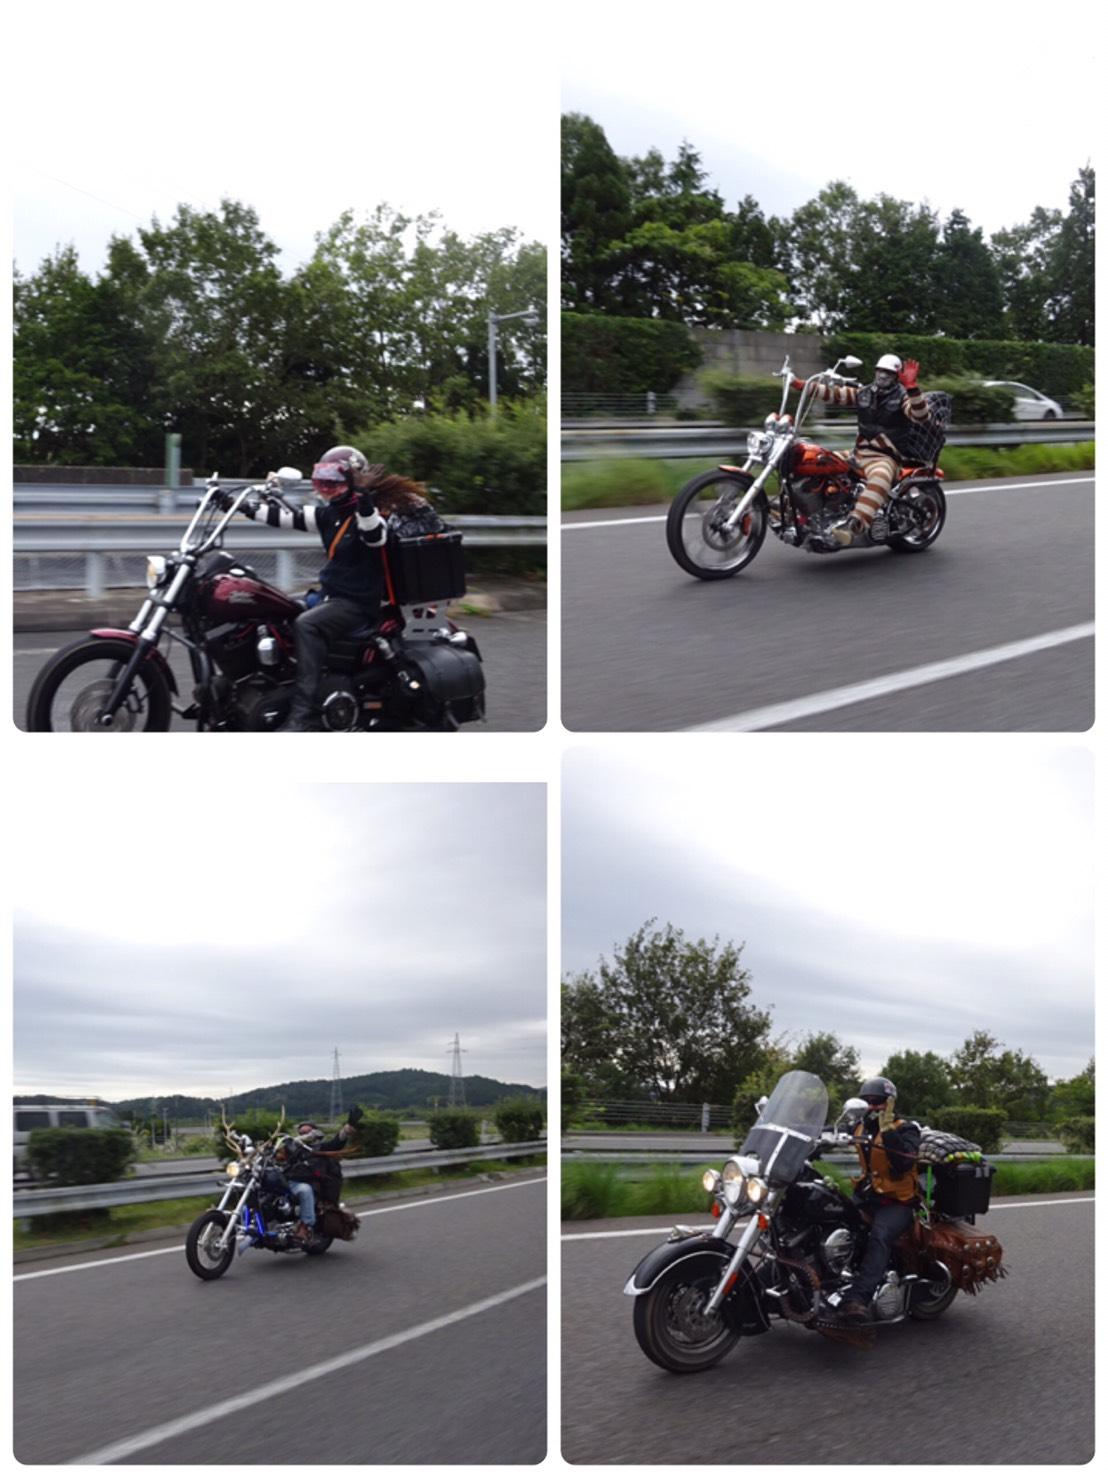 S__3809301.jpg